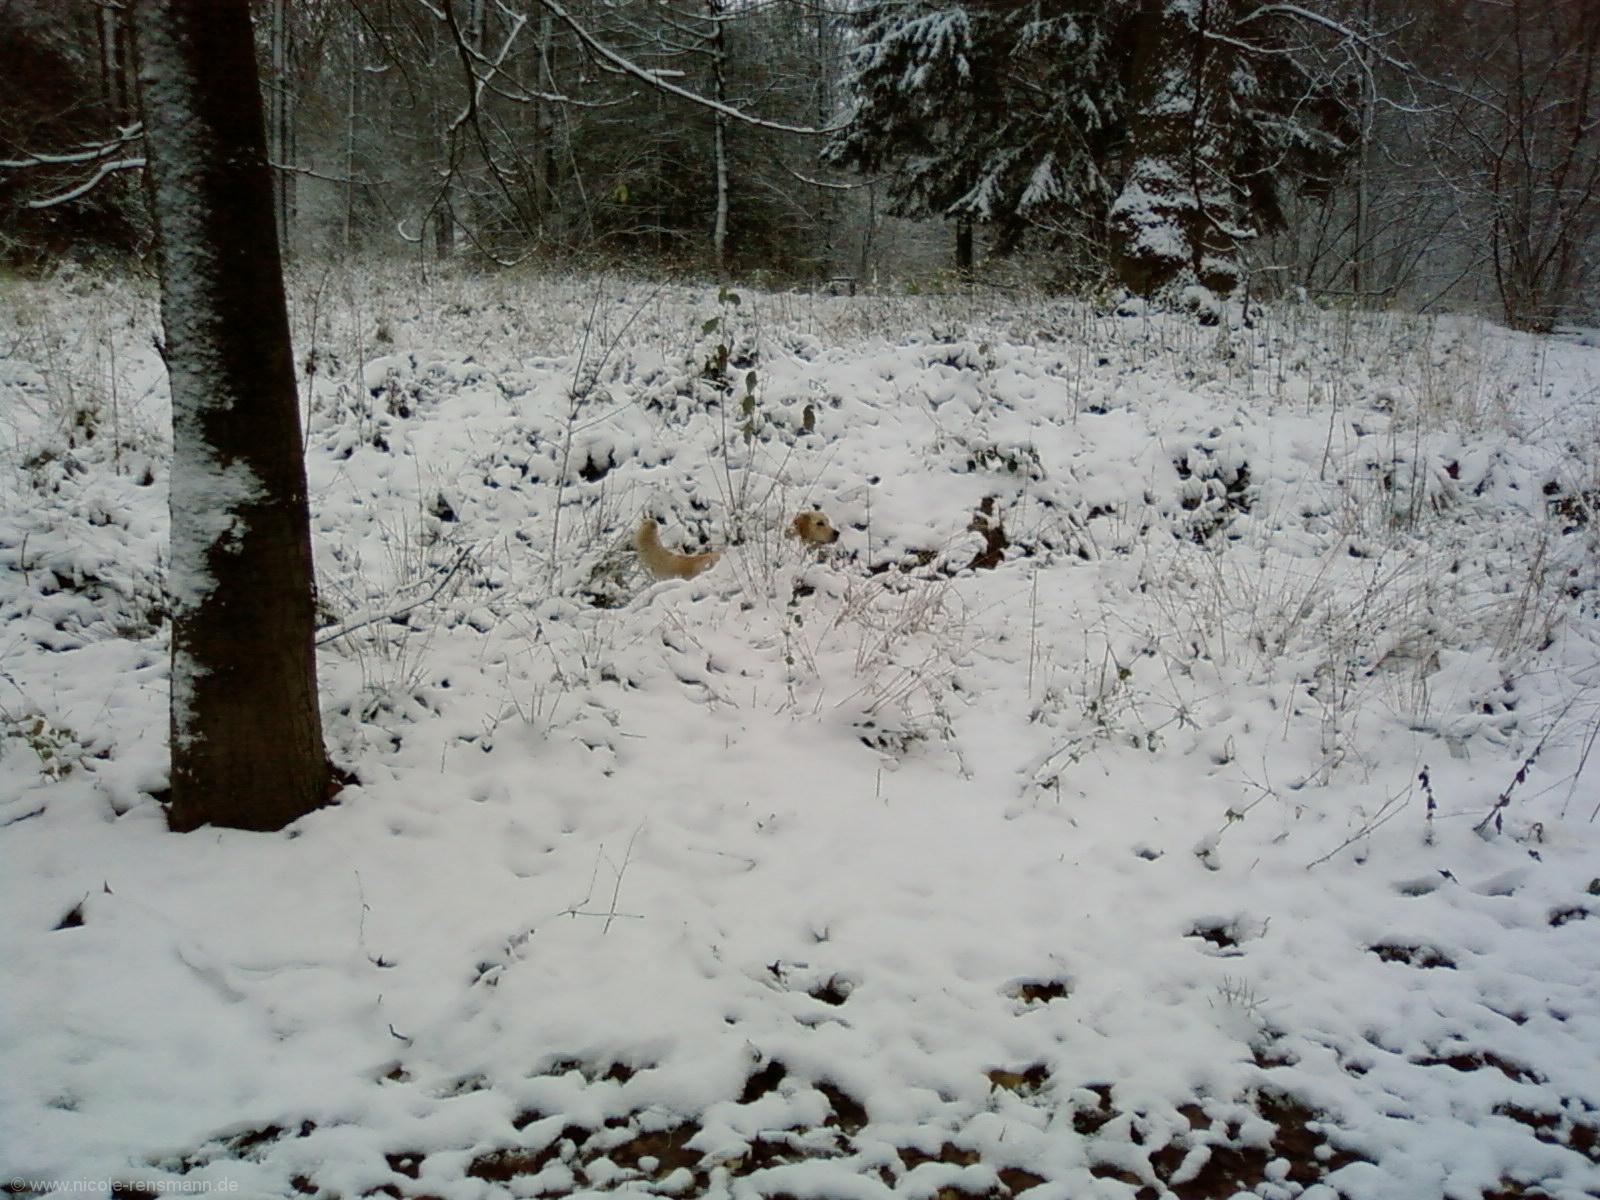 Lola im Schnee2